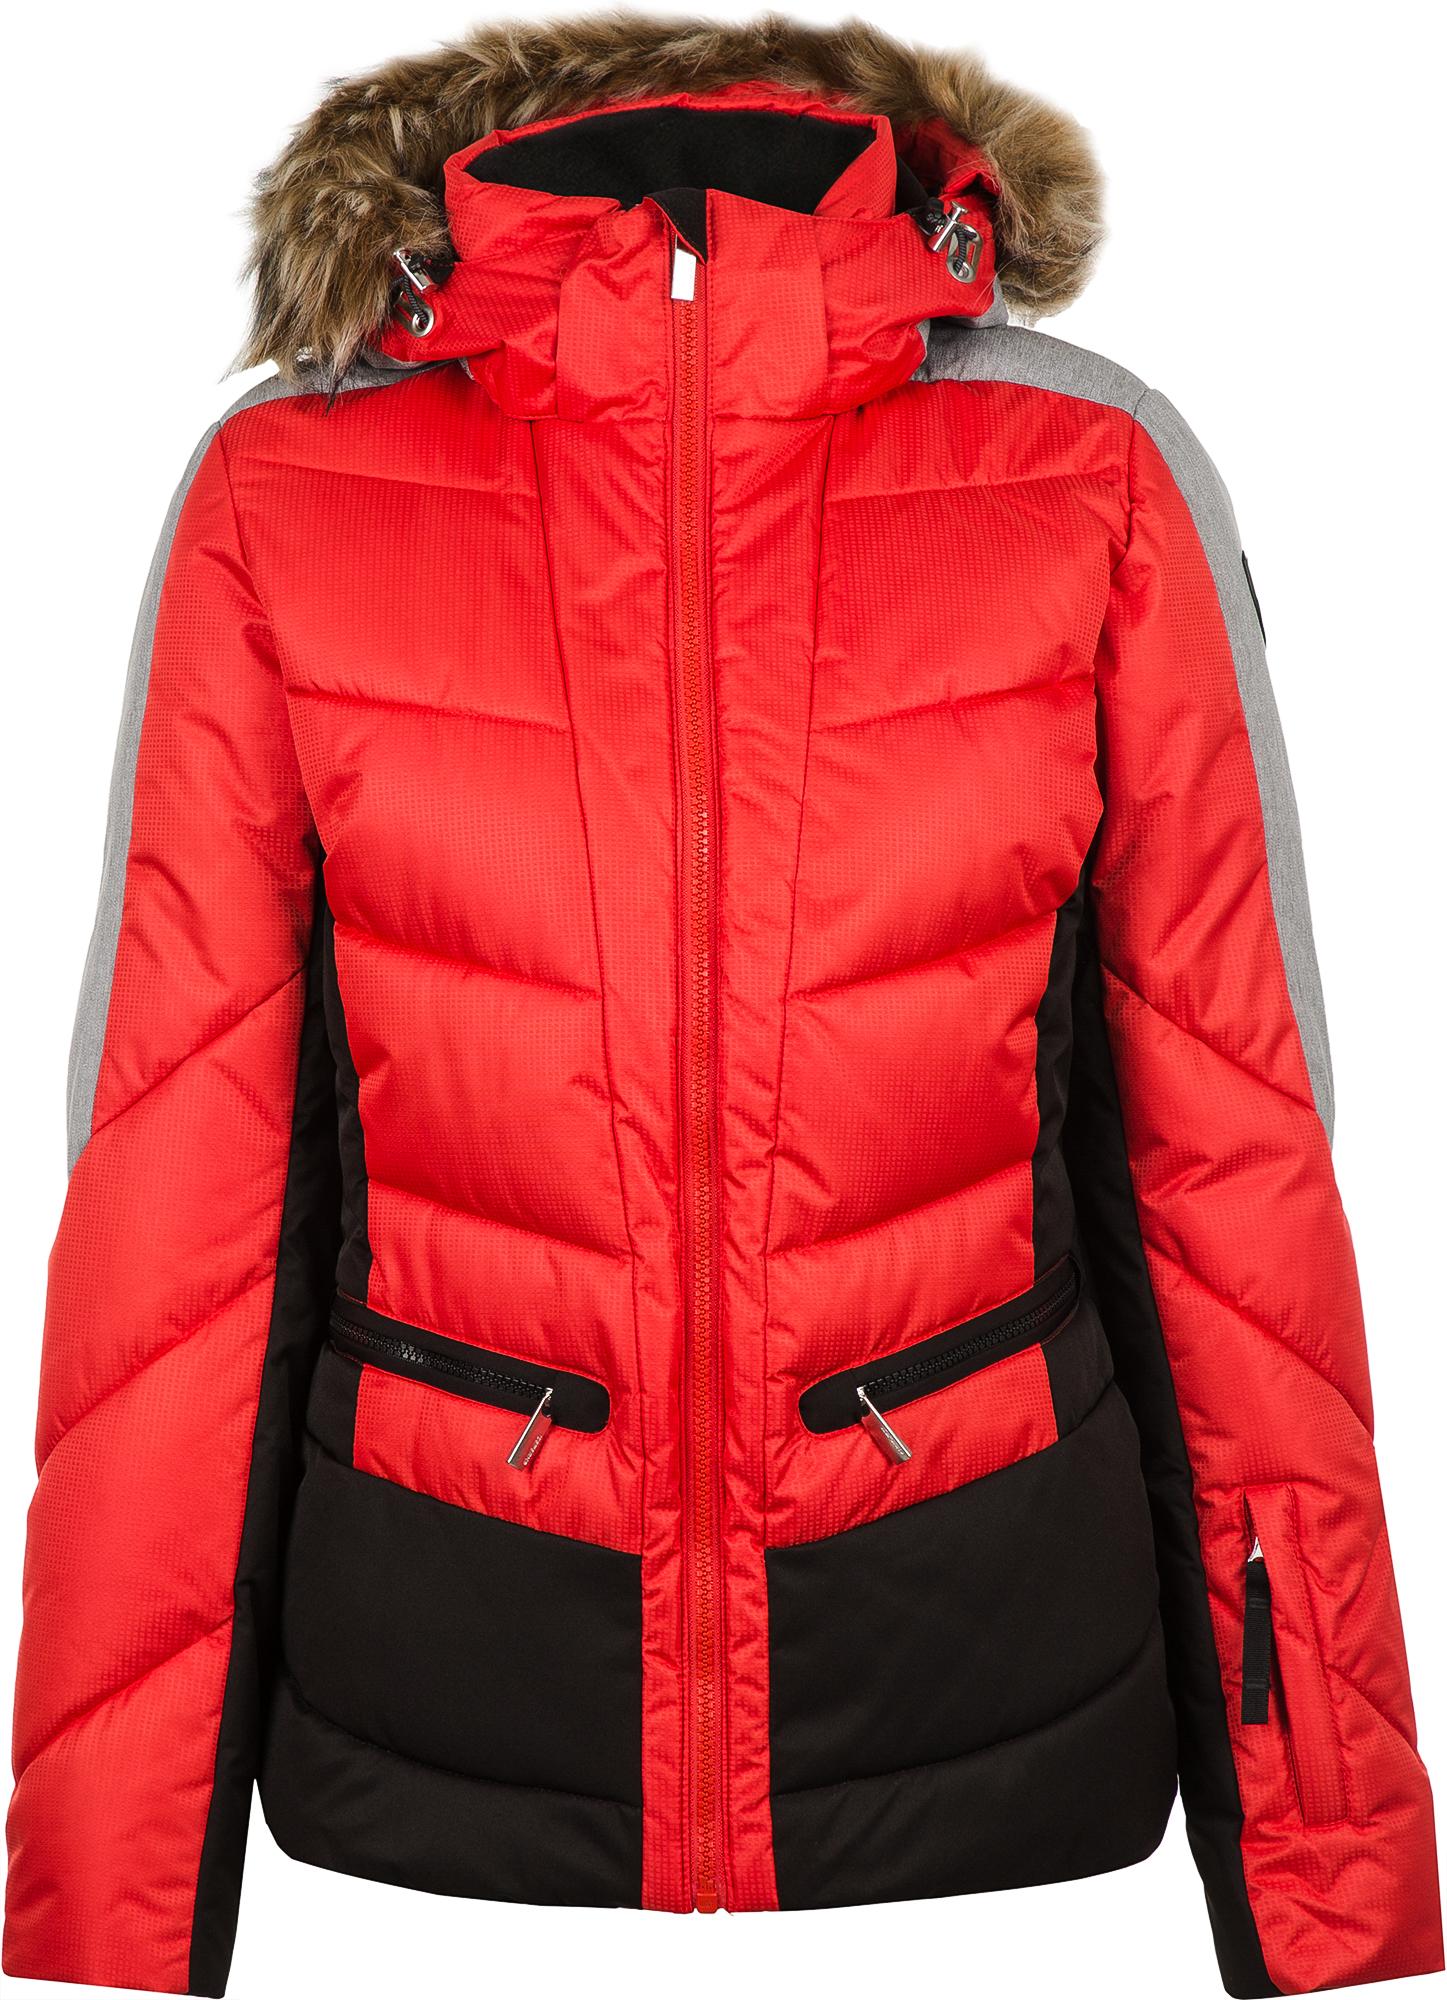 IcePeak Куртка утепленная женская IcePeak Electra, размер 46 куртка утепленная icepeak icepeak ic647emmwg54